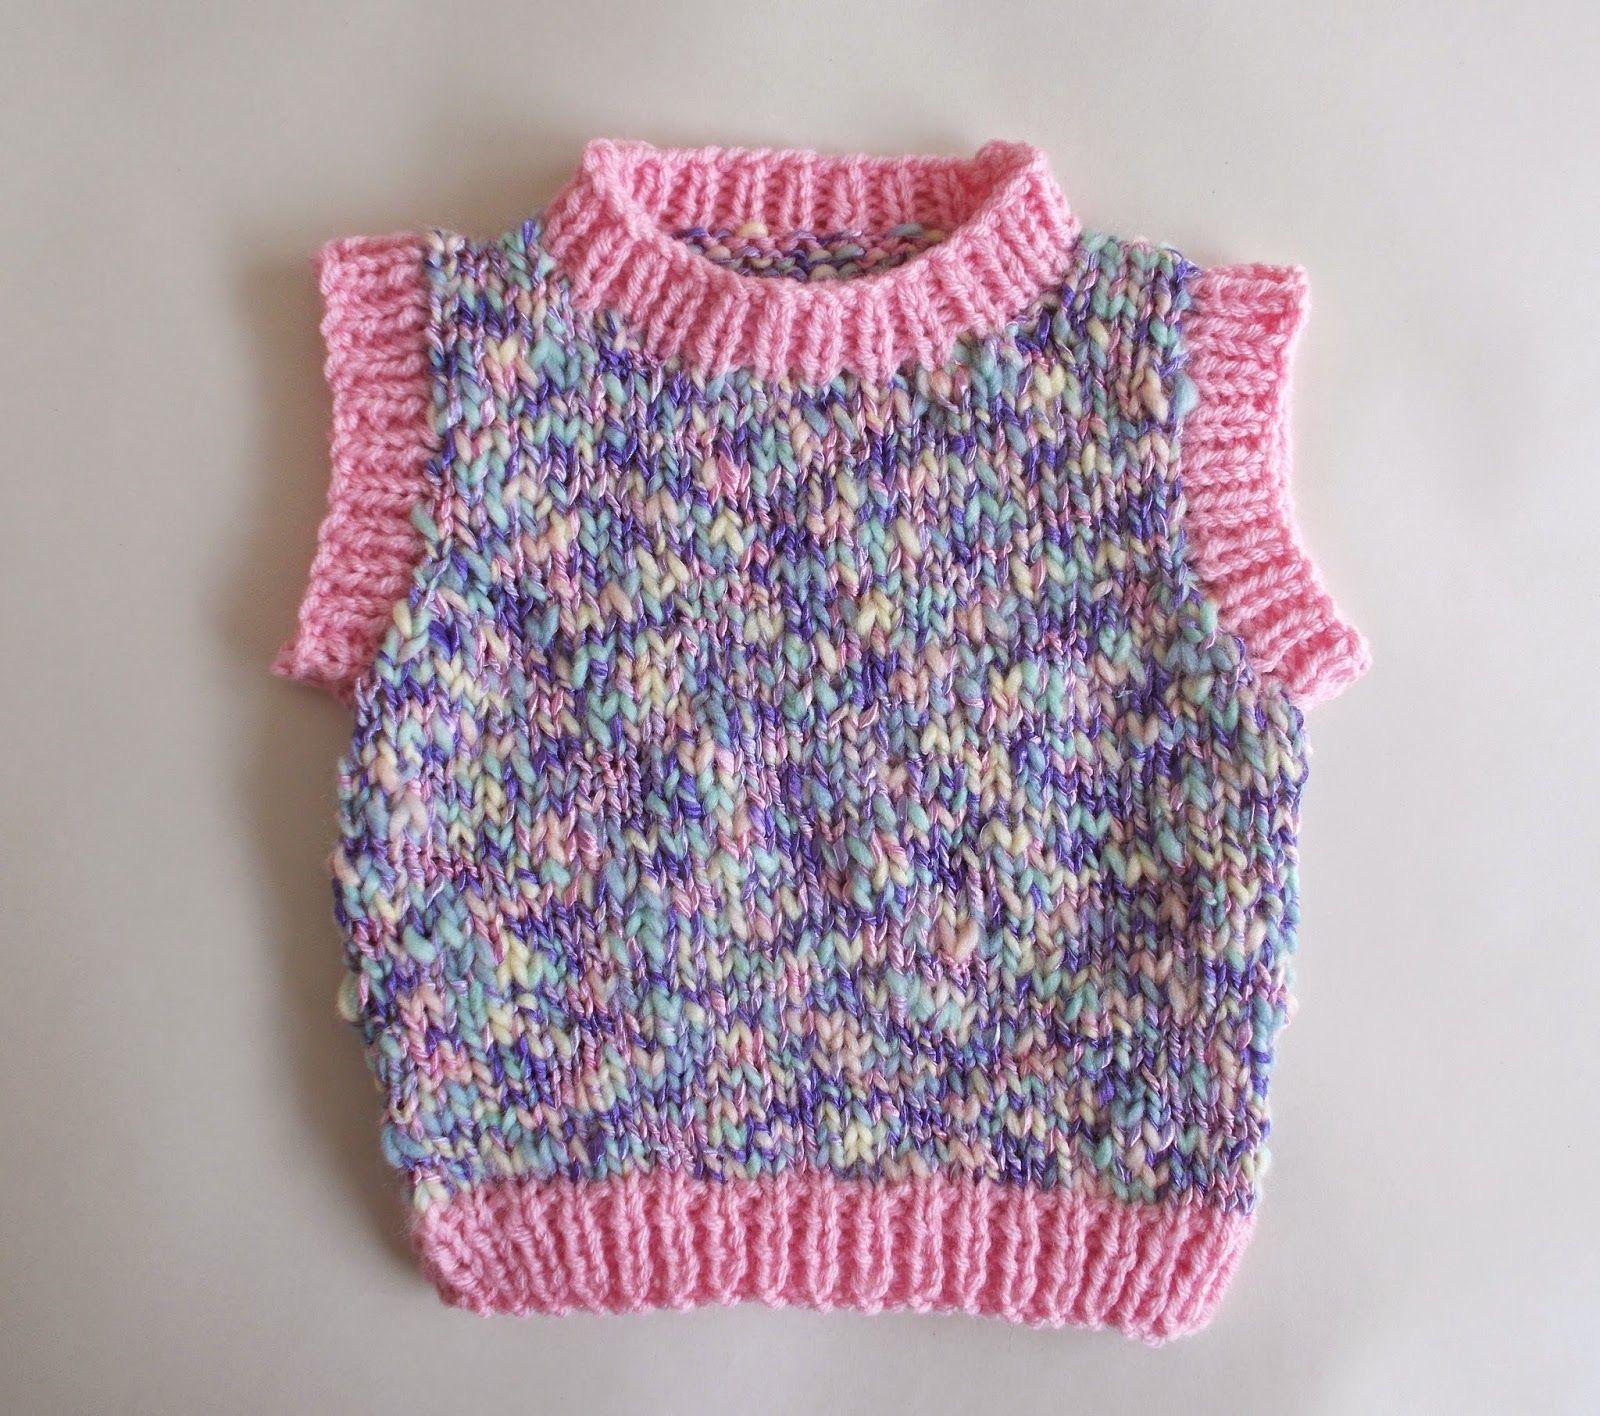 marianna\'s lazy daisy days: Moiselle chunky yarn sleeveless baby ...